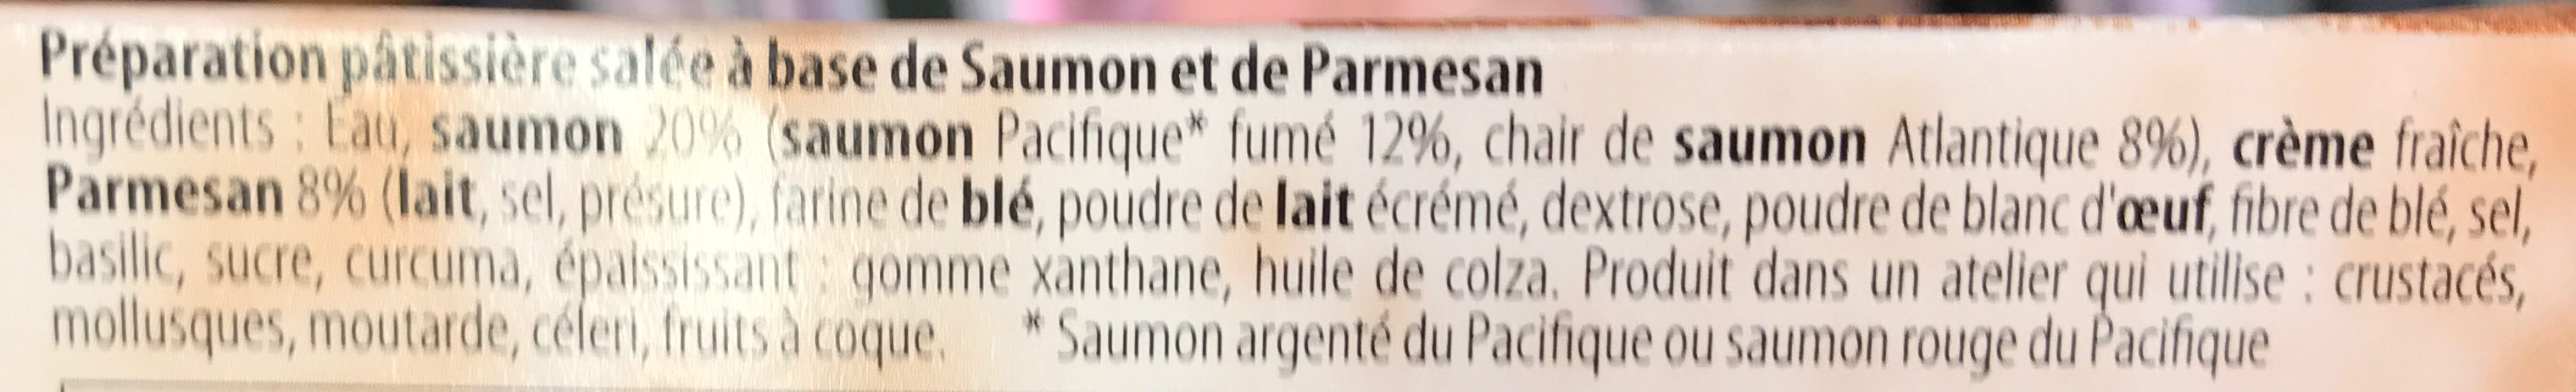 Apéri' Clafoutis au Saumon & Parmesan - Ingredients - fr